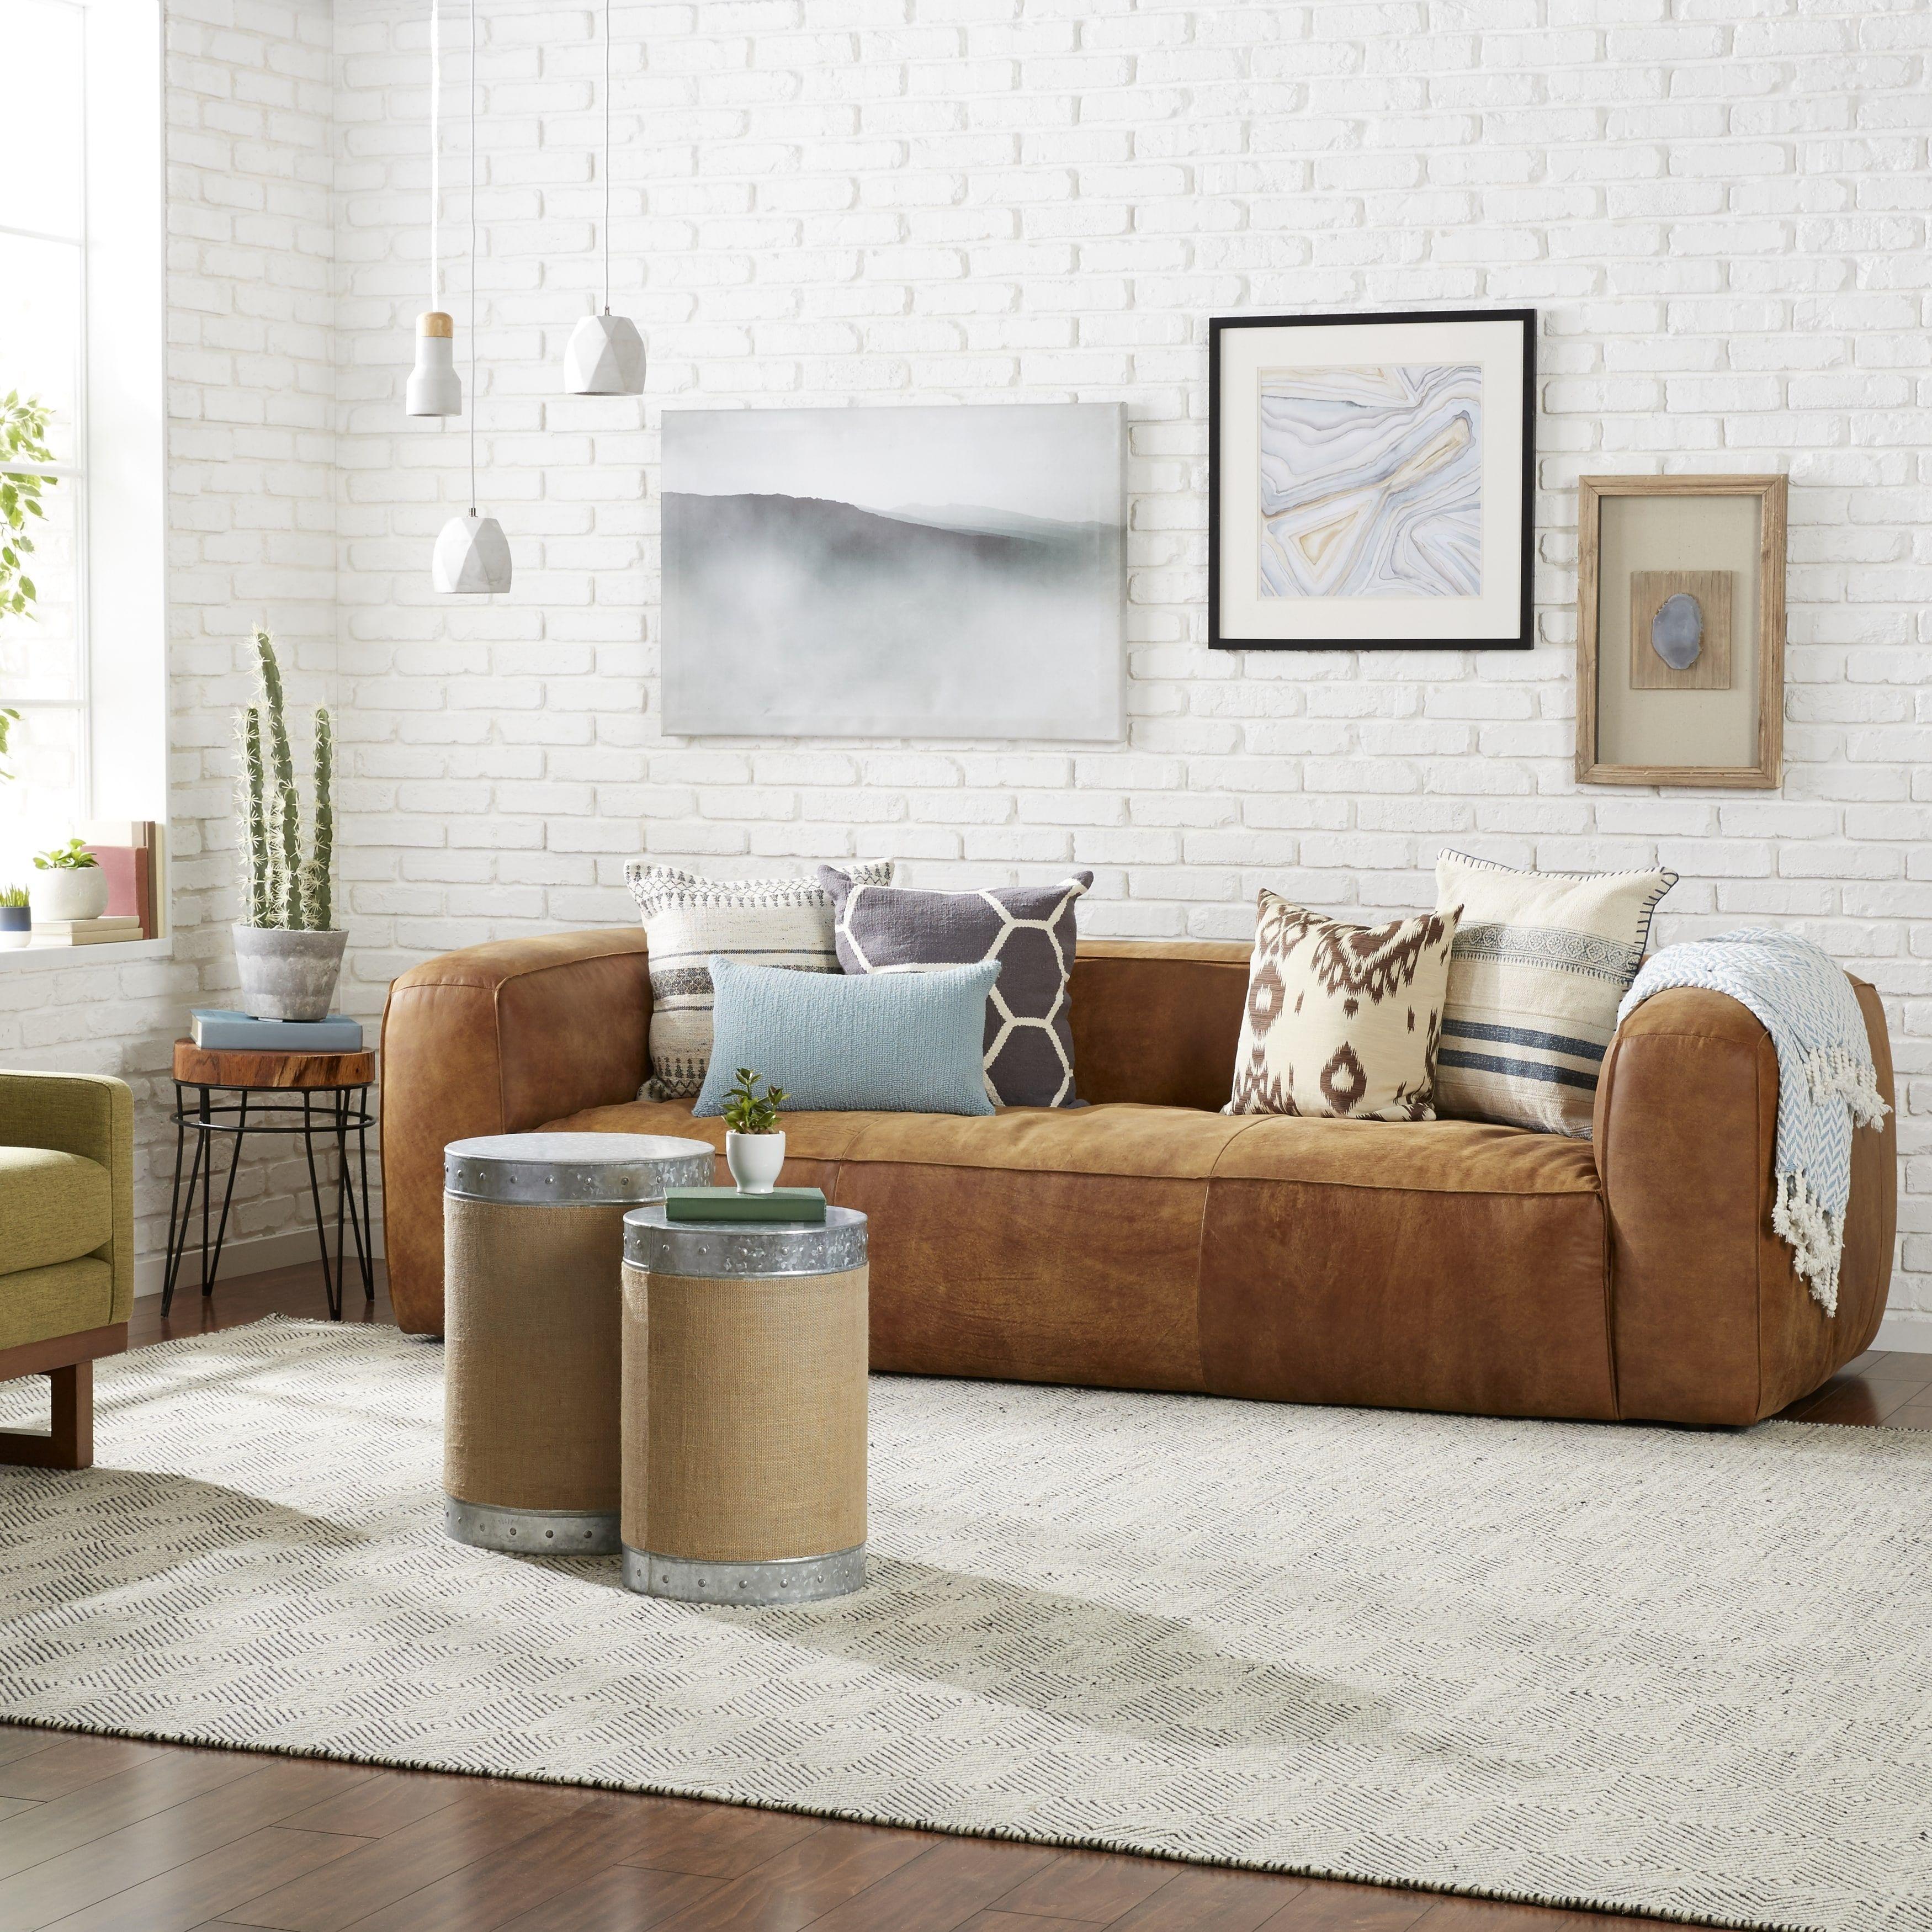 Diva Outback Bridle Italian Leather Sofa | Overstock.com Shopping ...